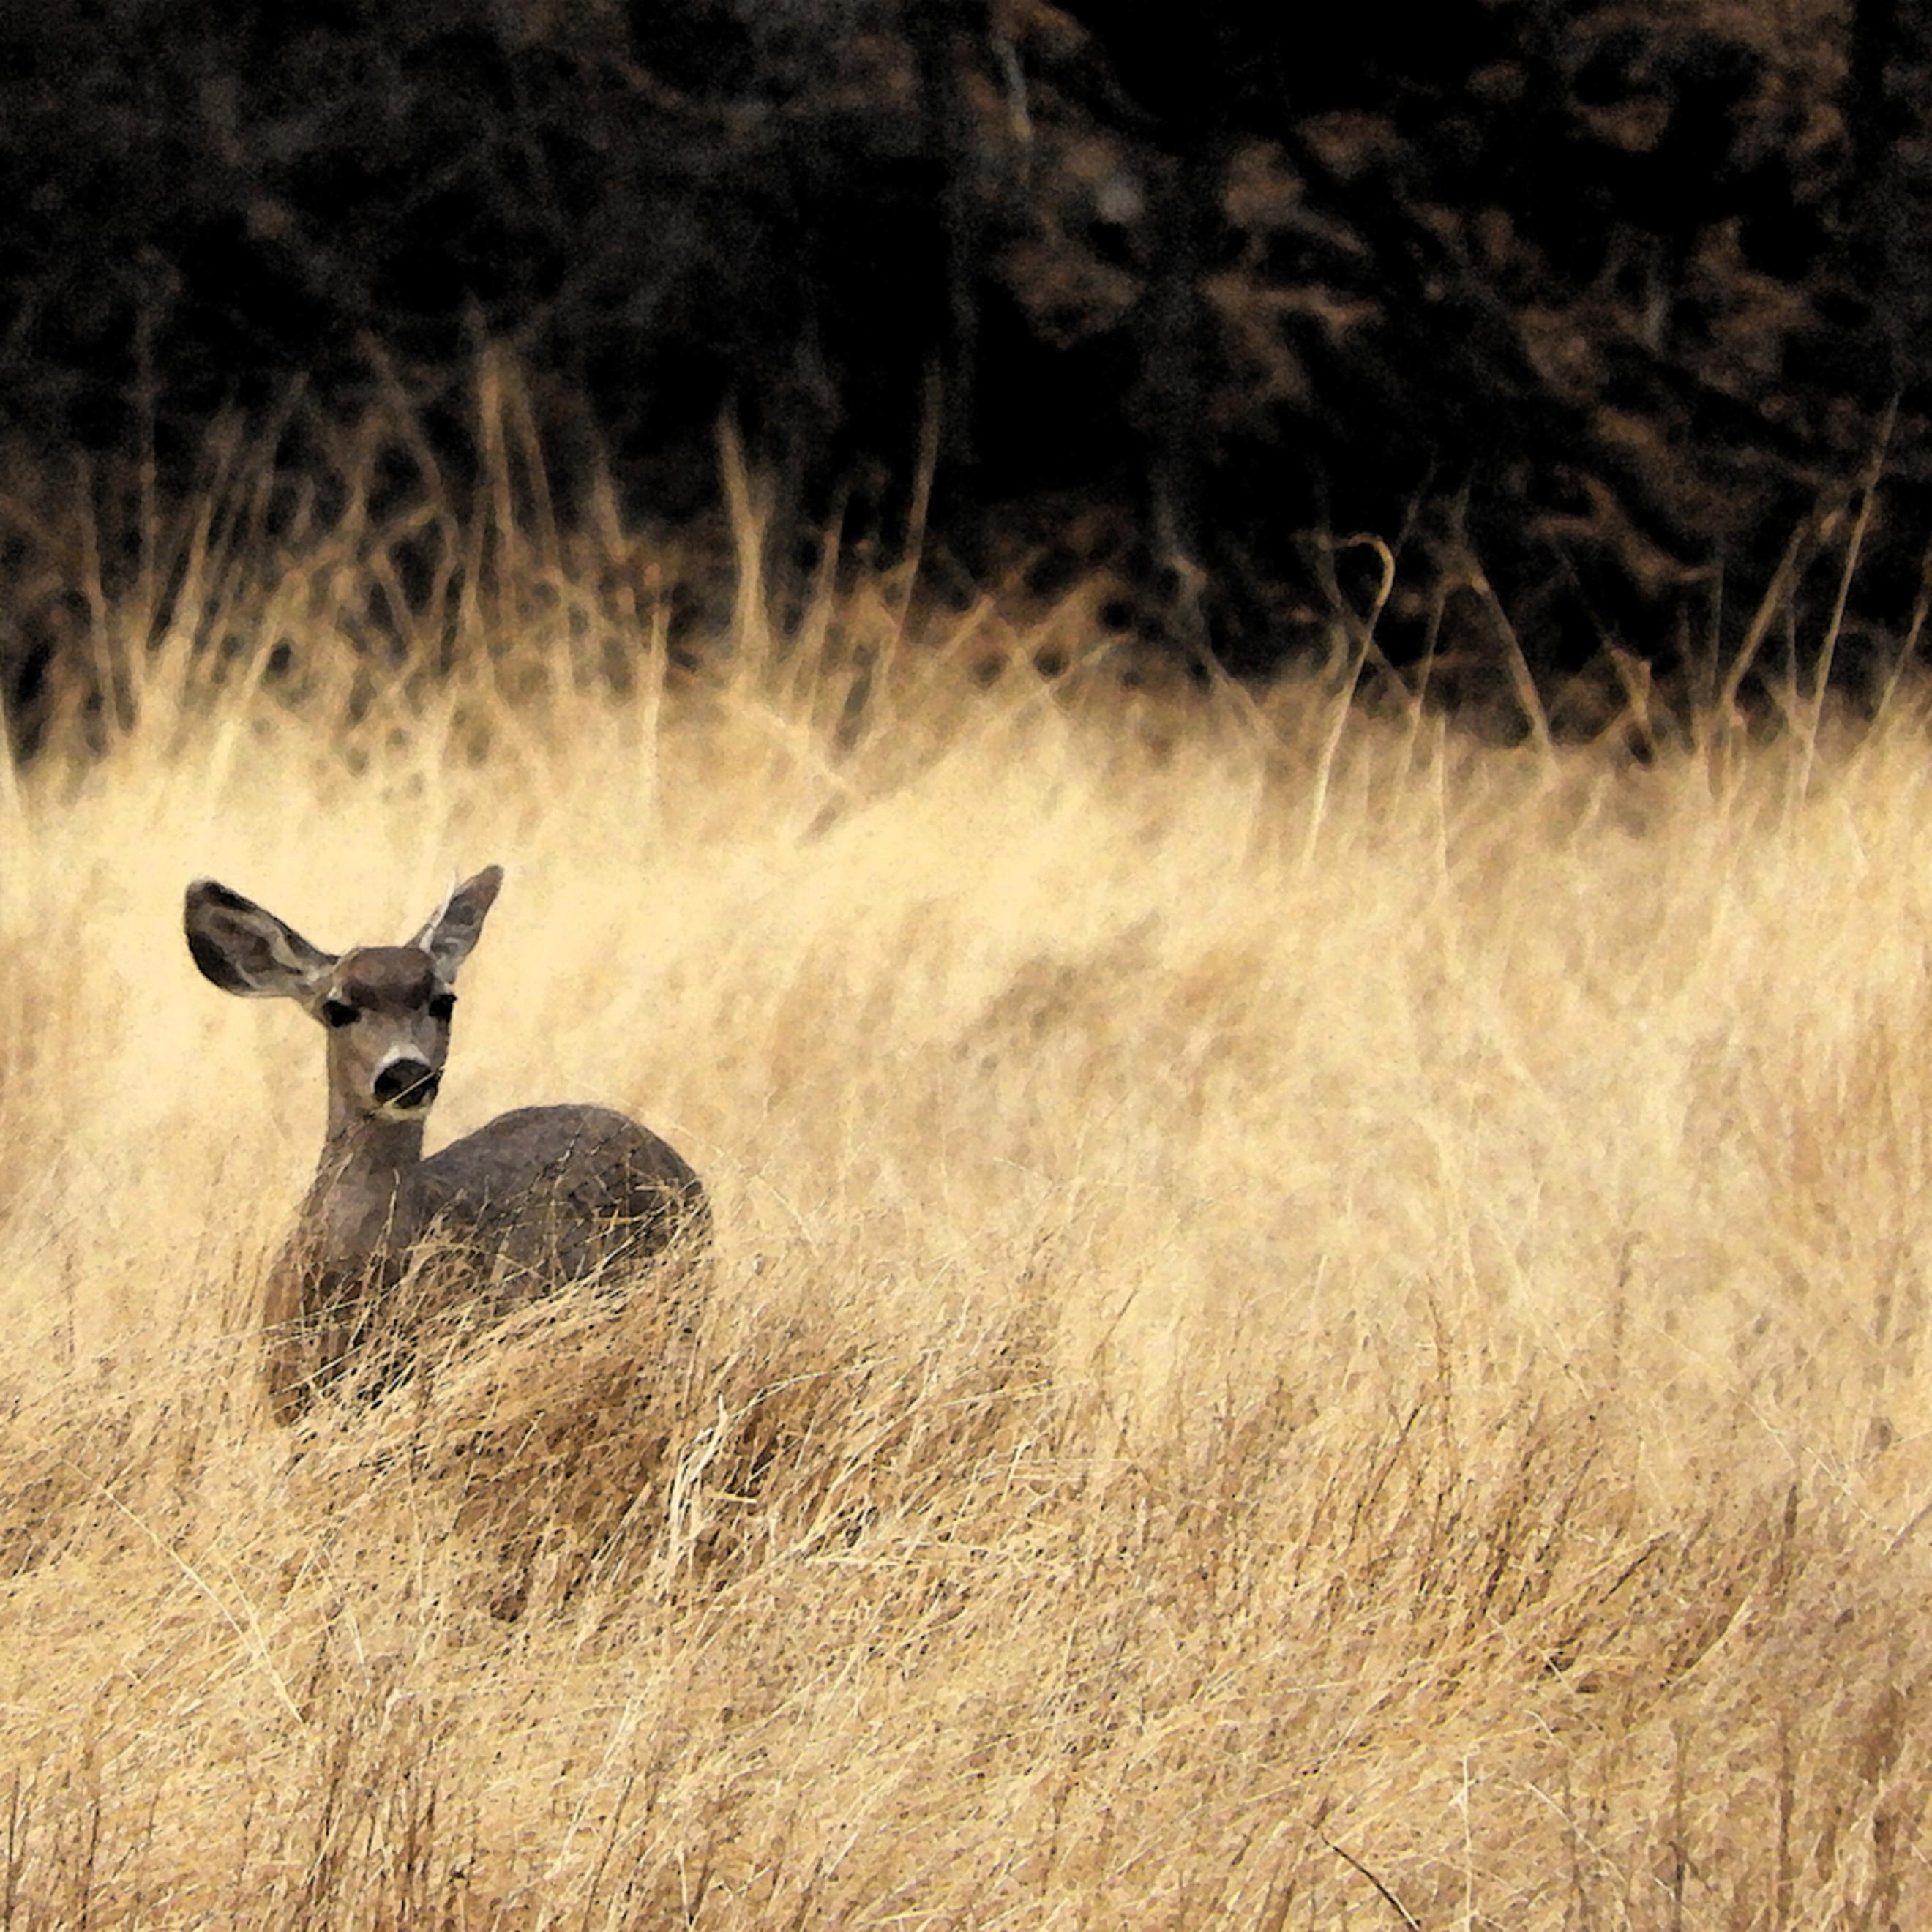 Dscn0173 deer in grass yrfjrv